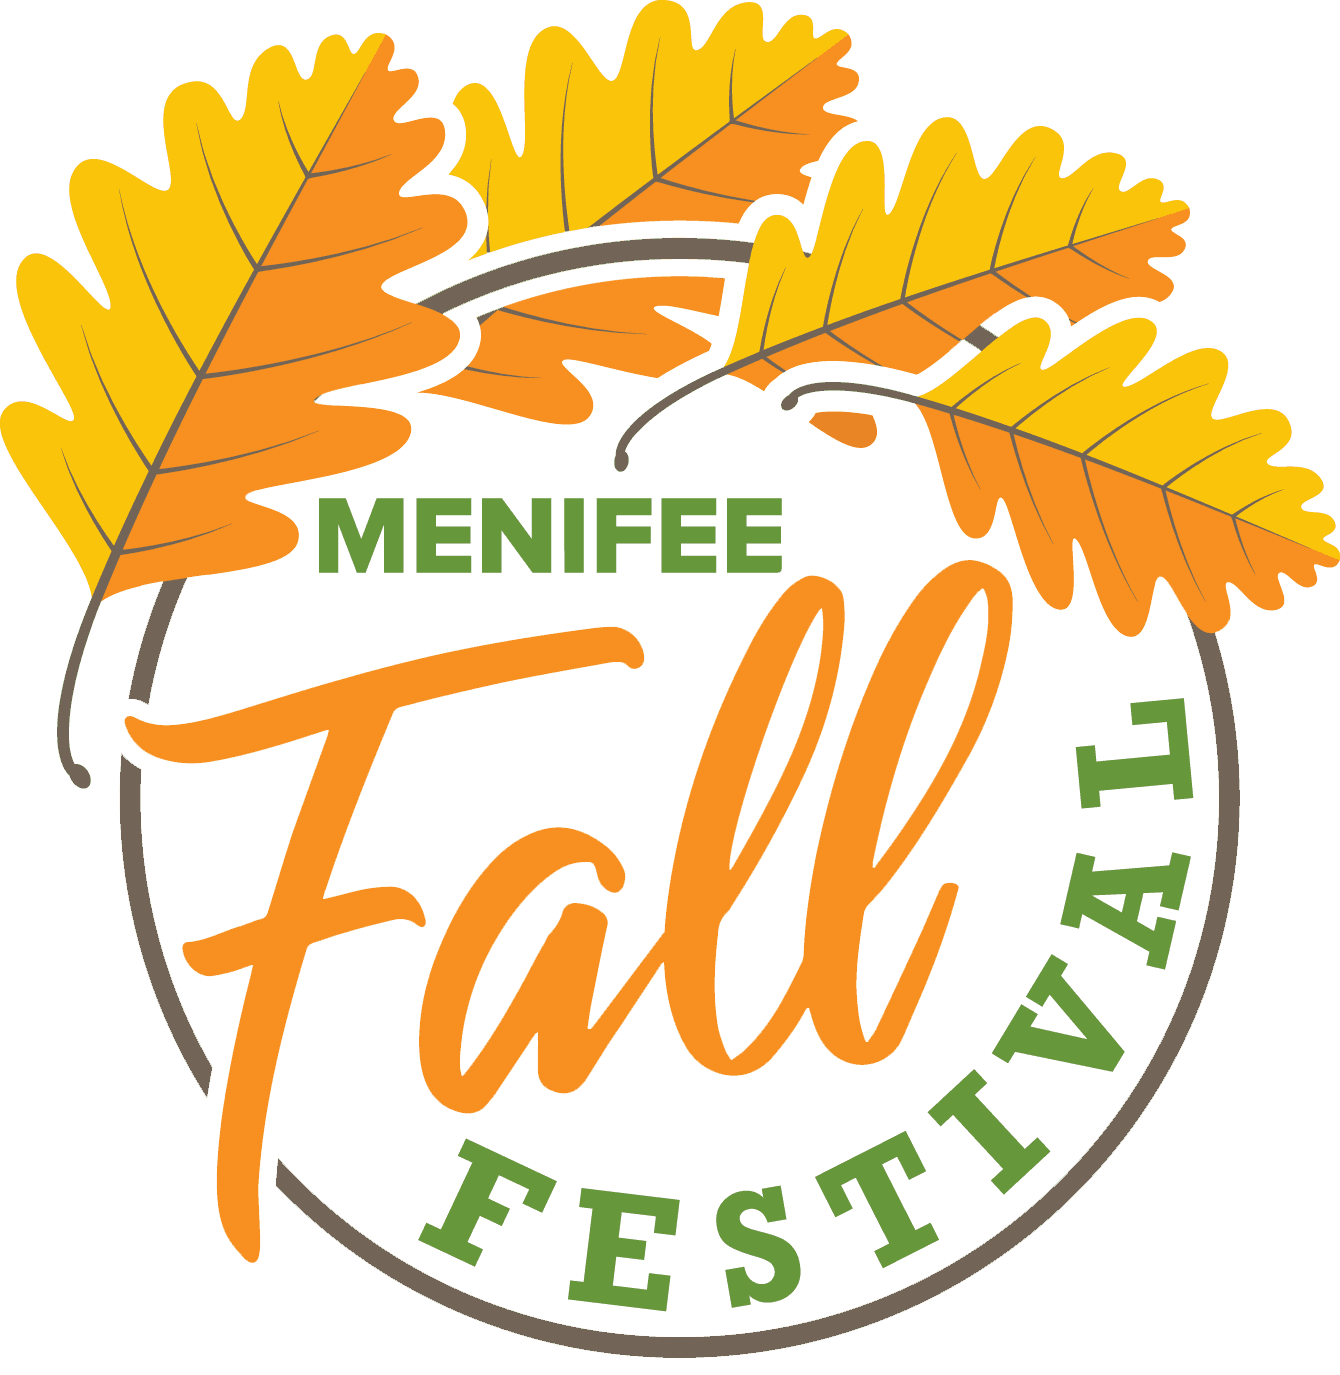 Fallfestivallogo Final Fall Festival Festival Fall